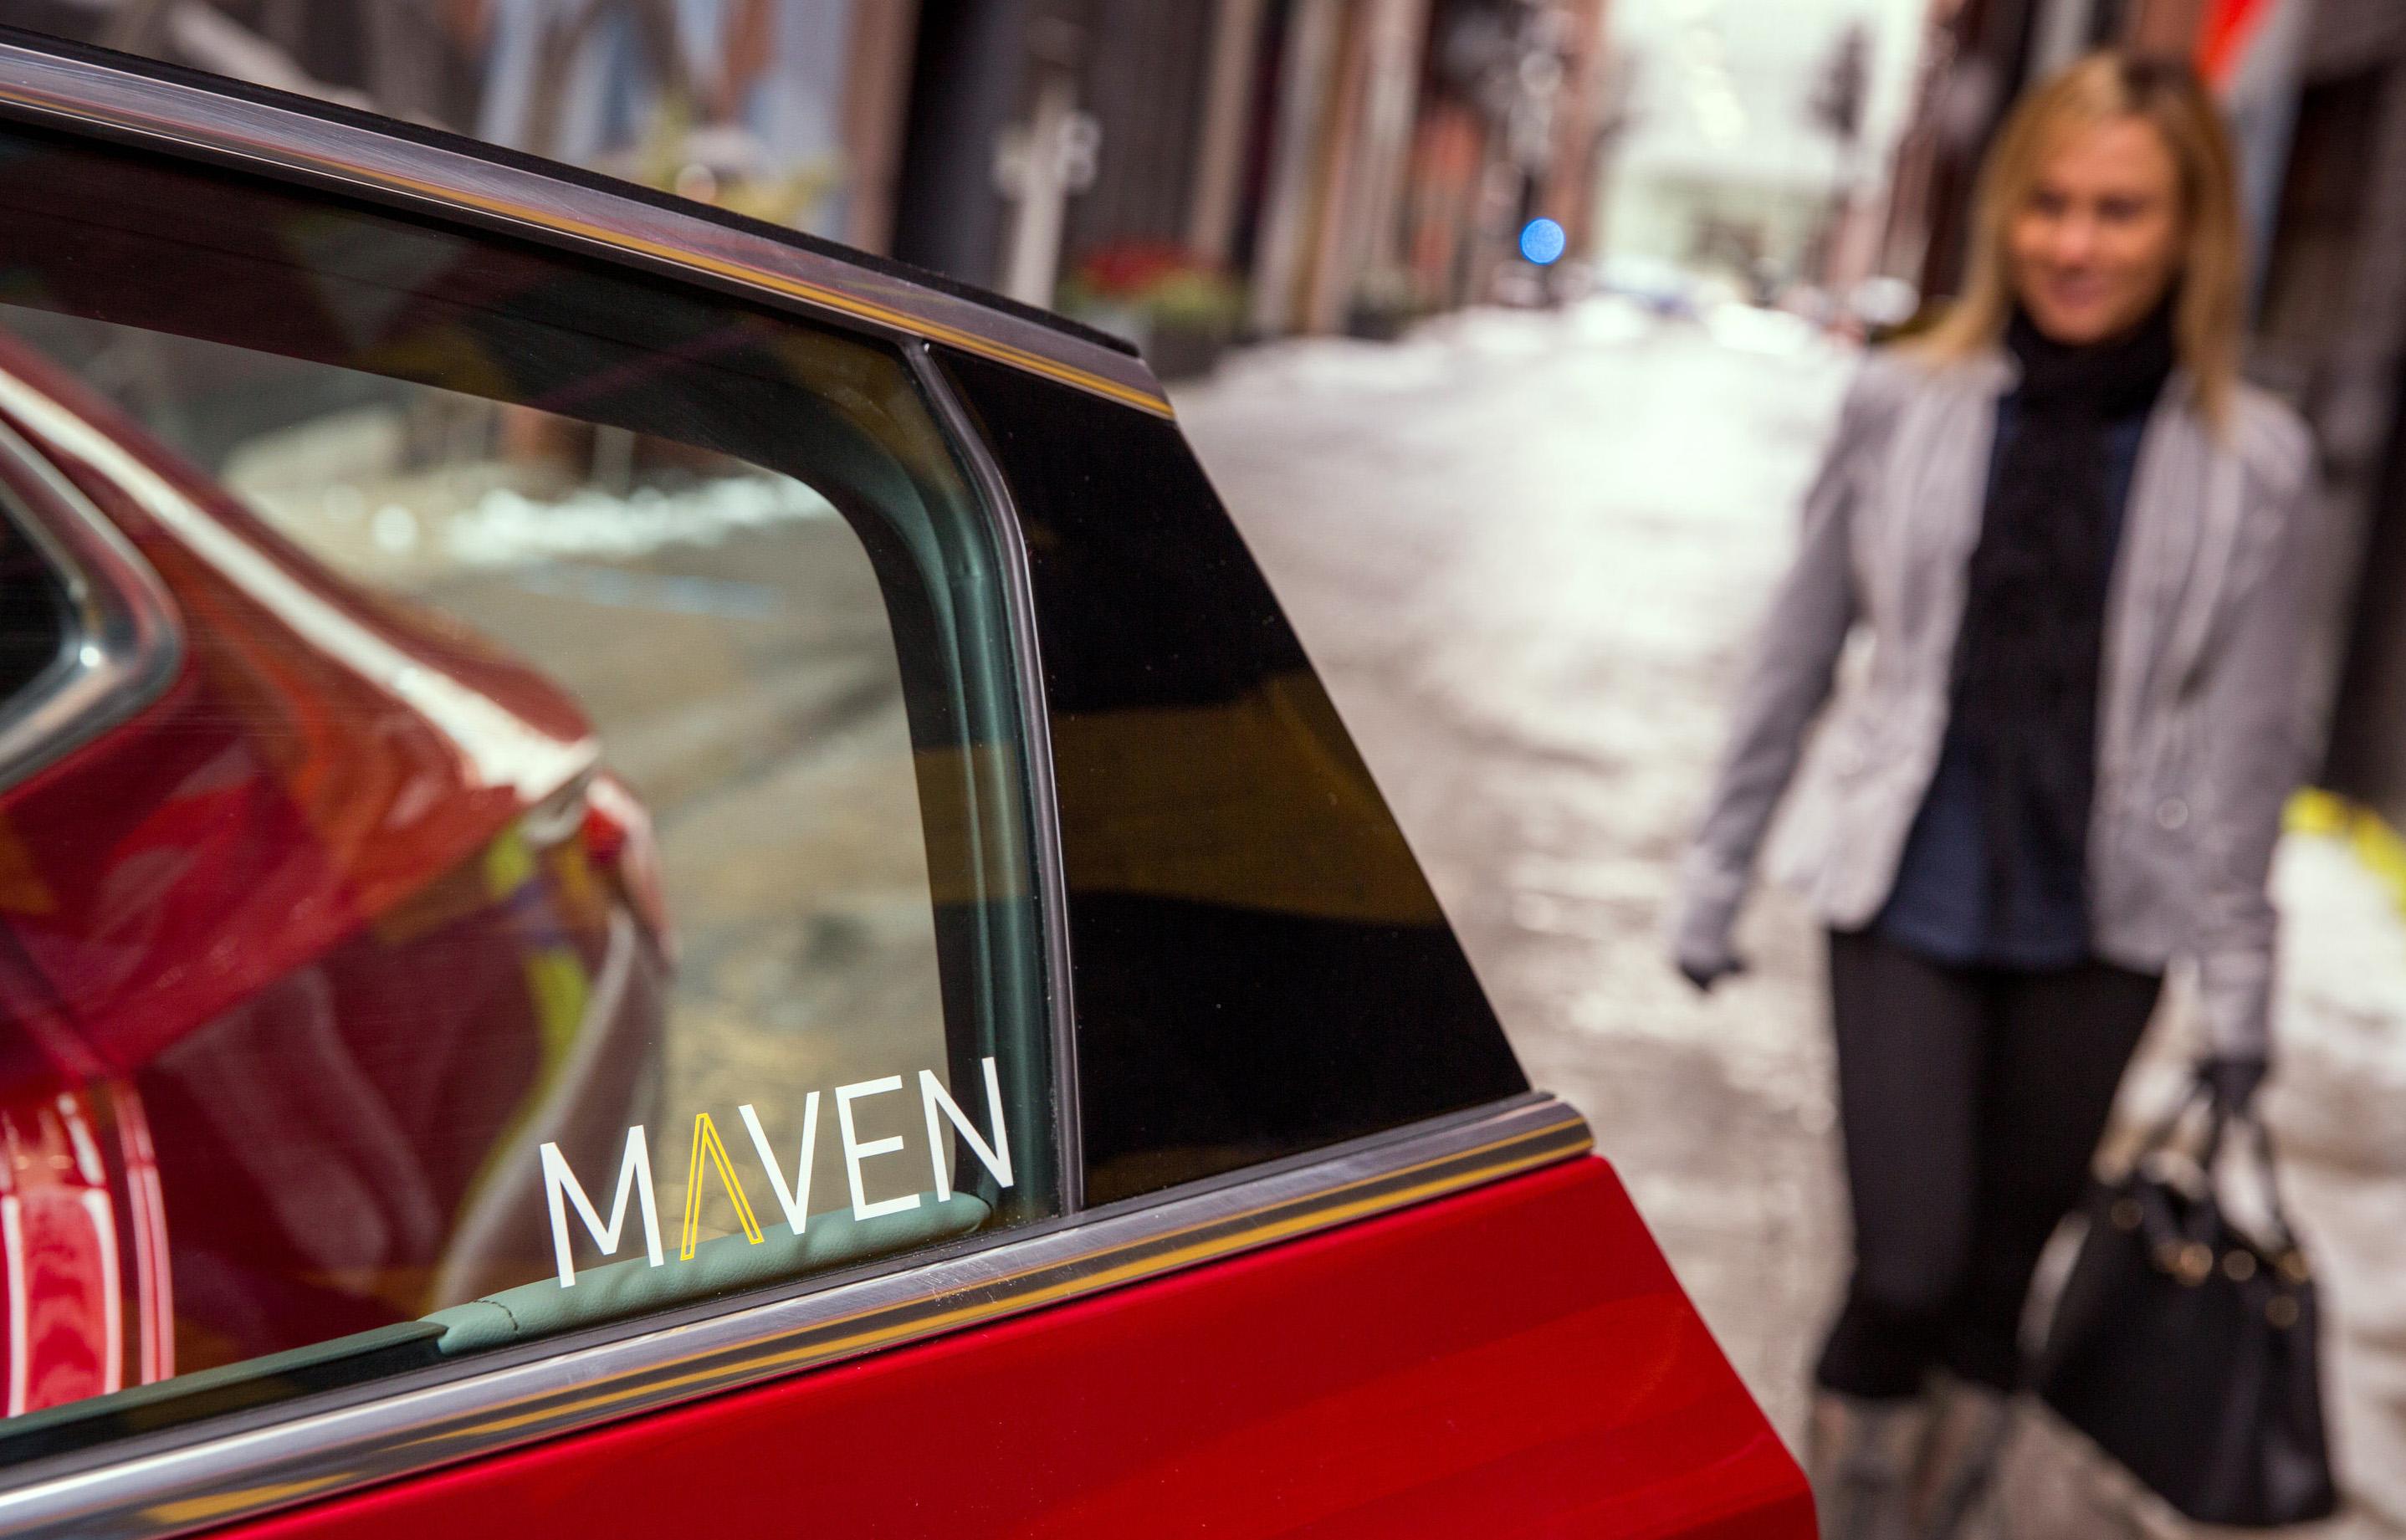 Maven Car Sharing